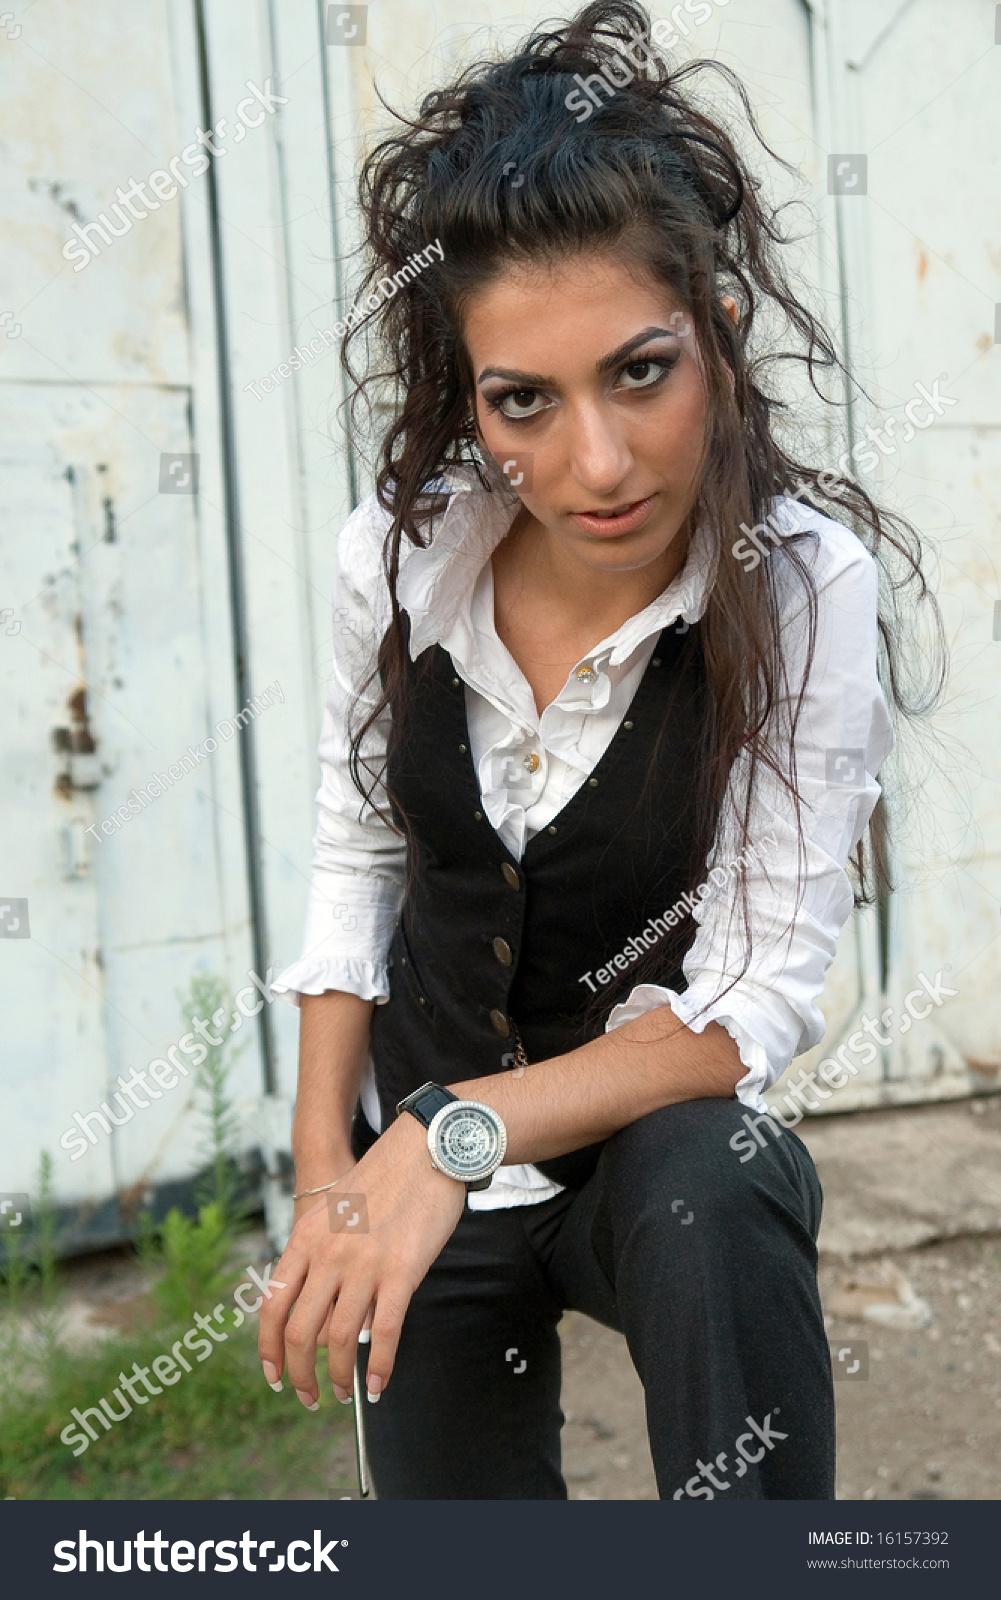 armenian cute girls on streets